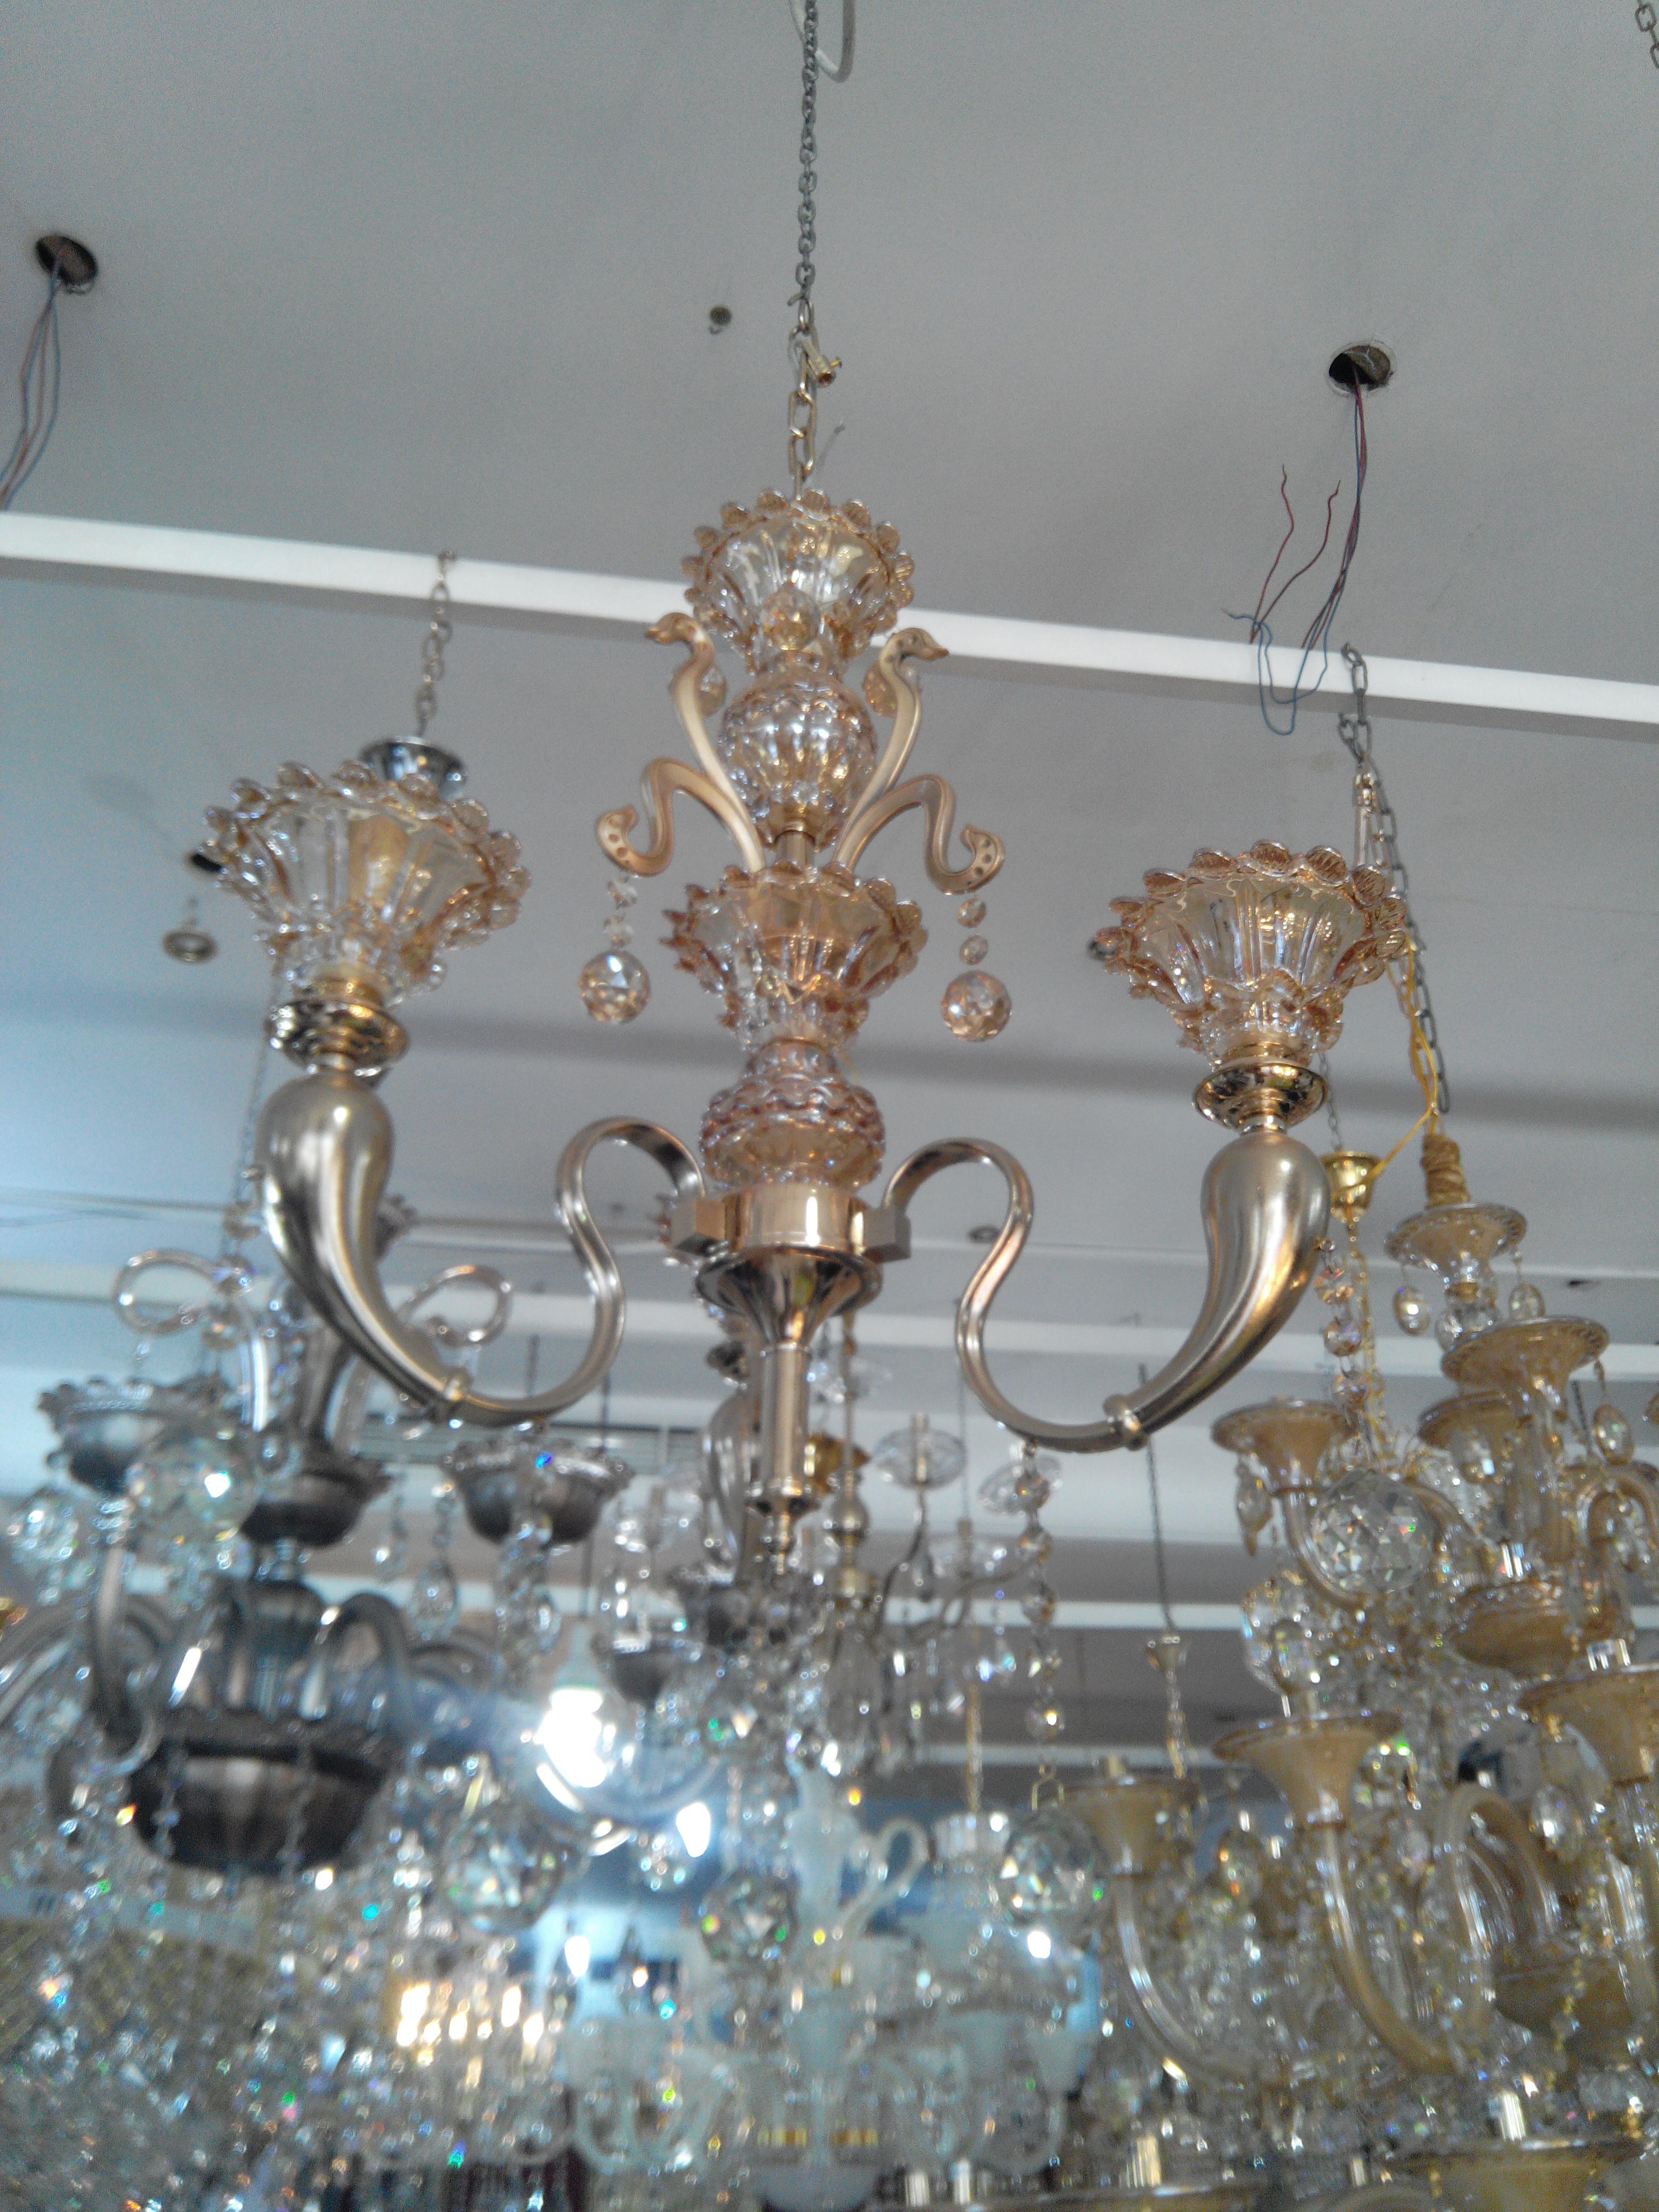 lustre 3f plaqu or 14 carats cristal meubles et d coration tunisie. Black Bedroom Furniture Sets. Home Design Ideas